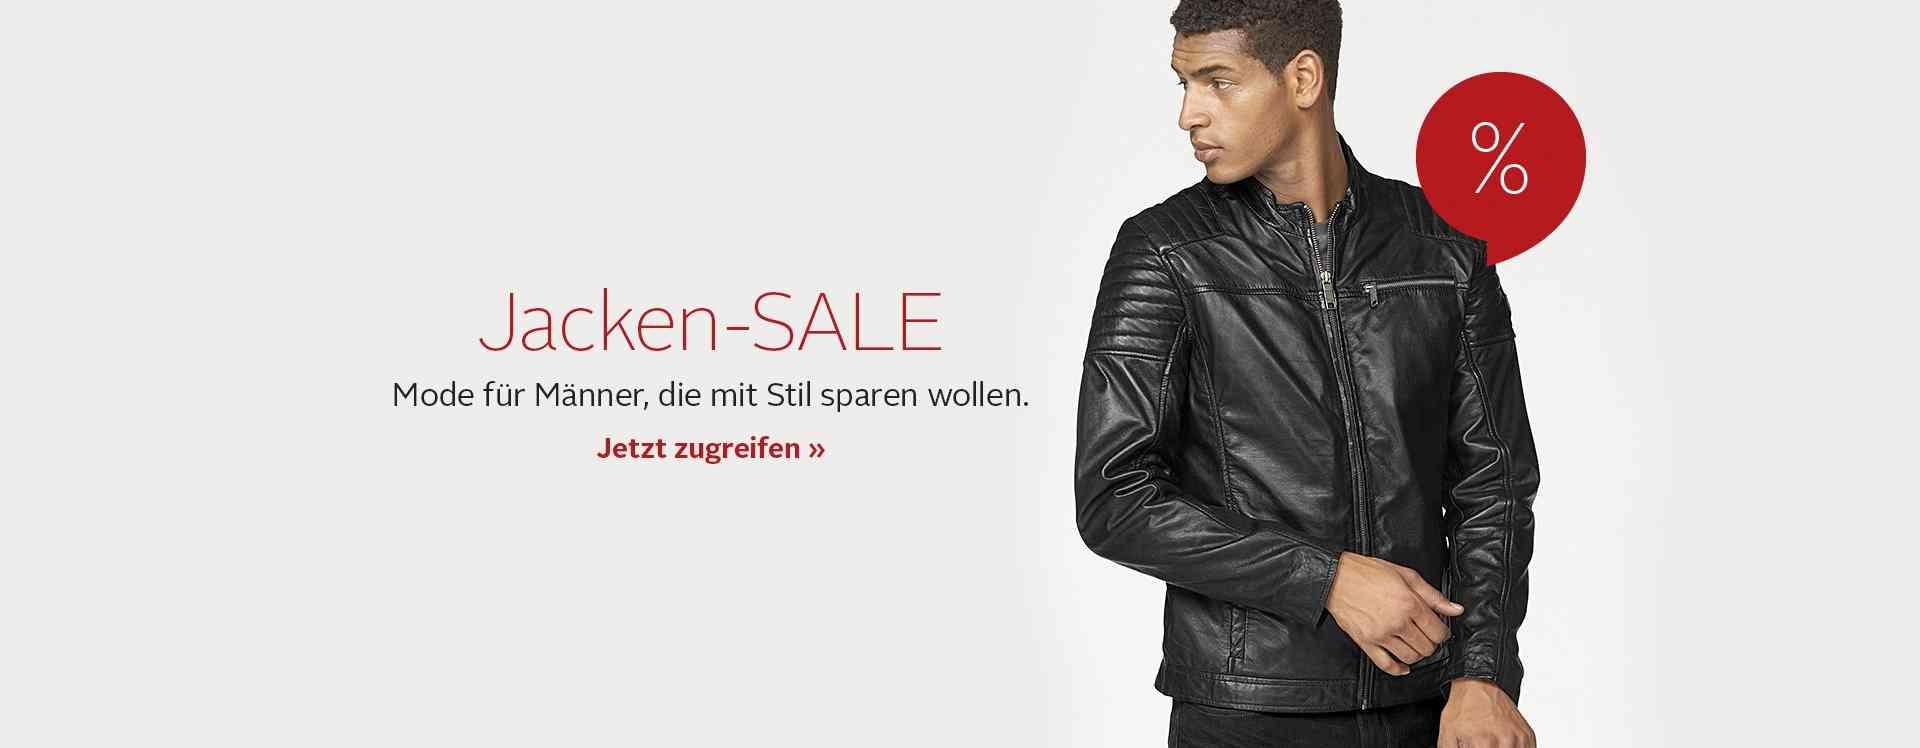 Herren-Jacken im Sale.